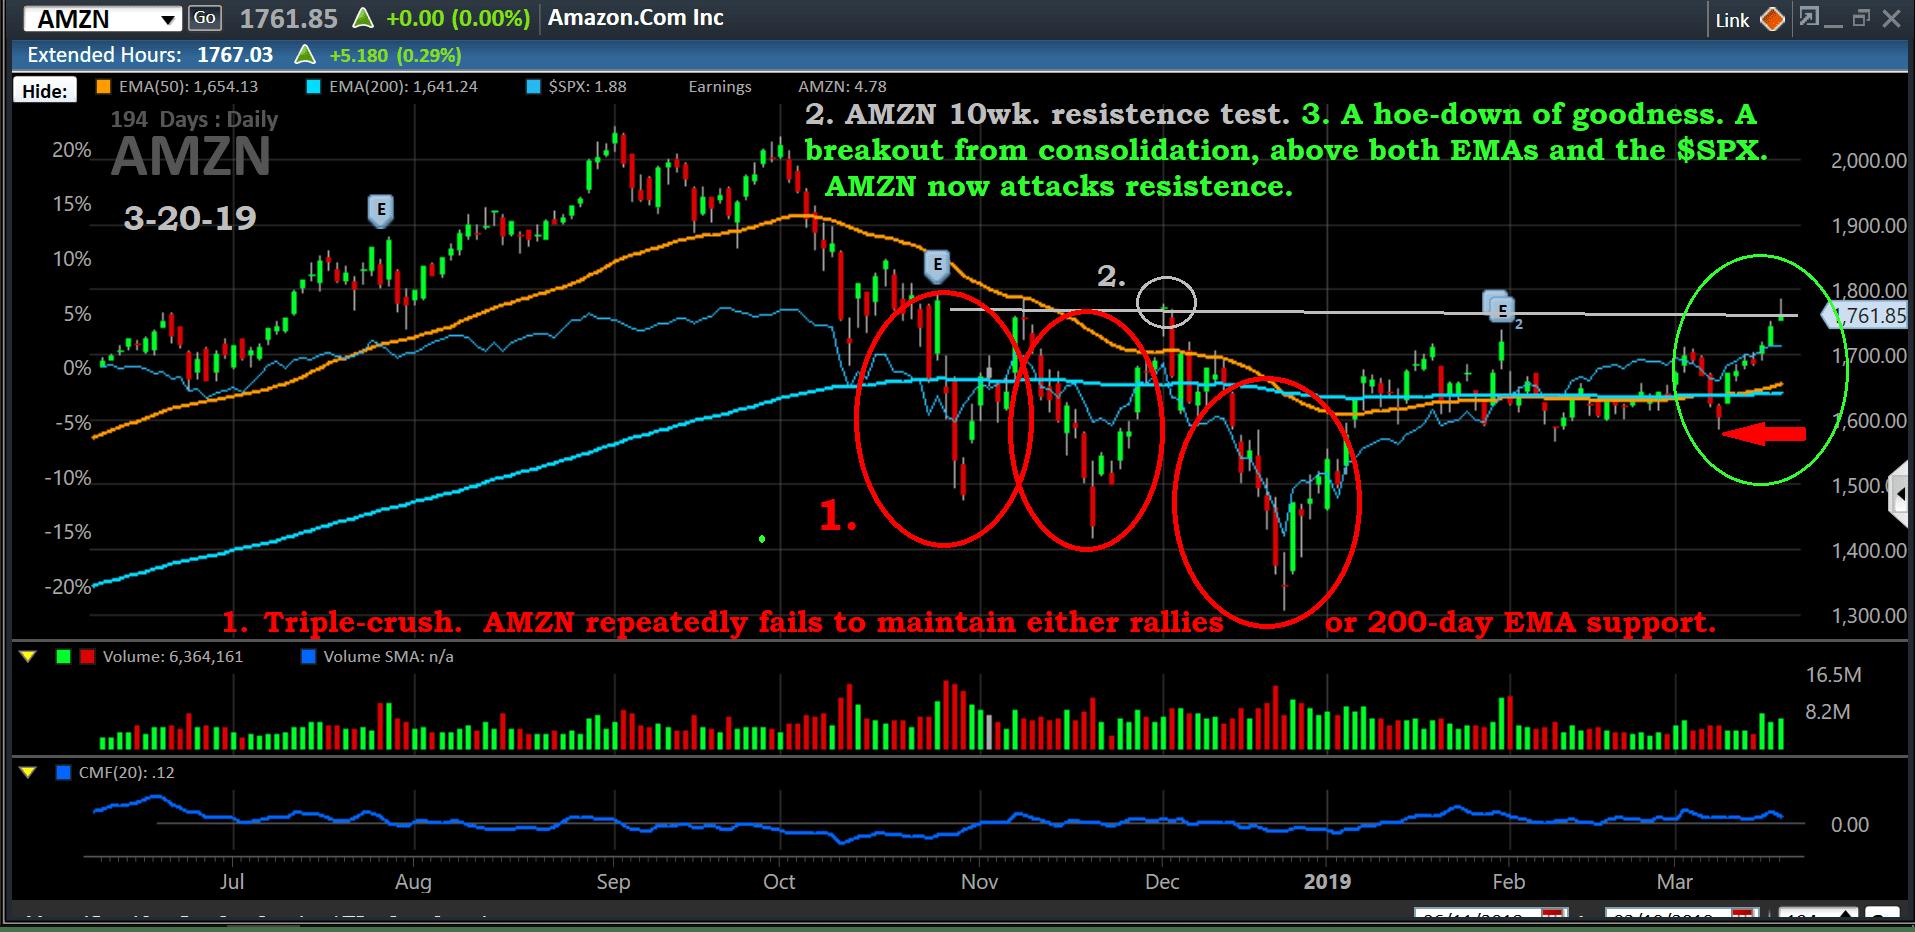 Chart, AMZN, 3-20-19